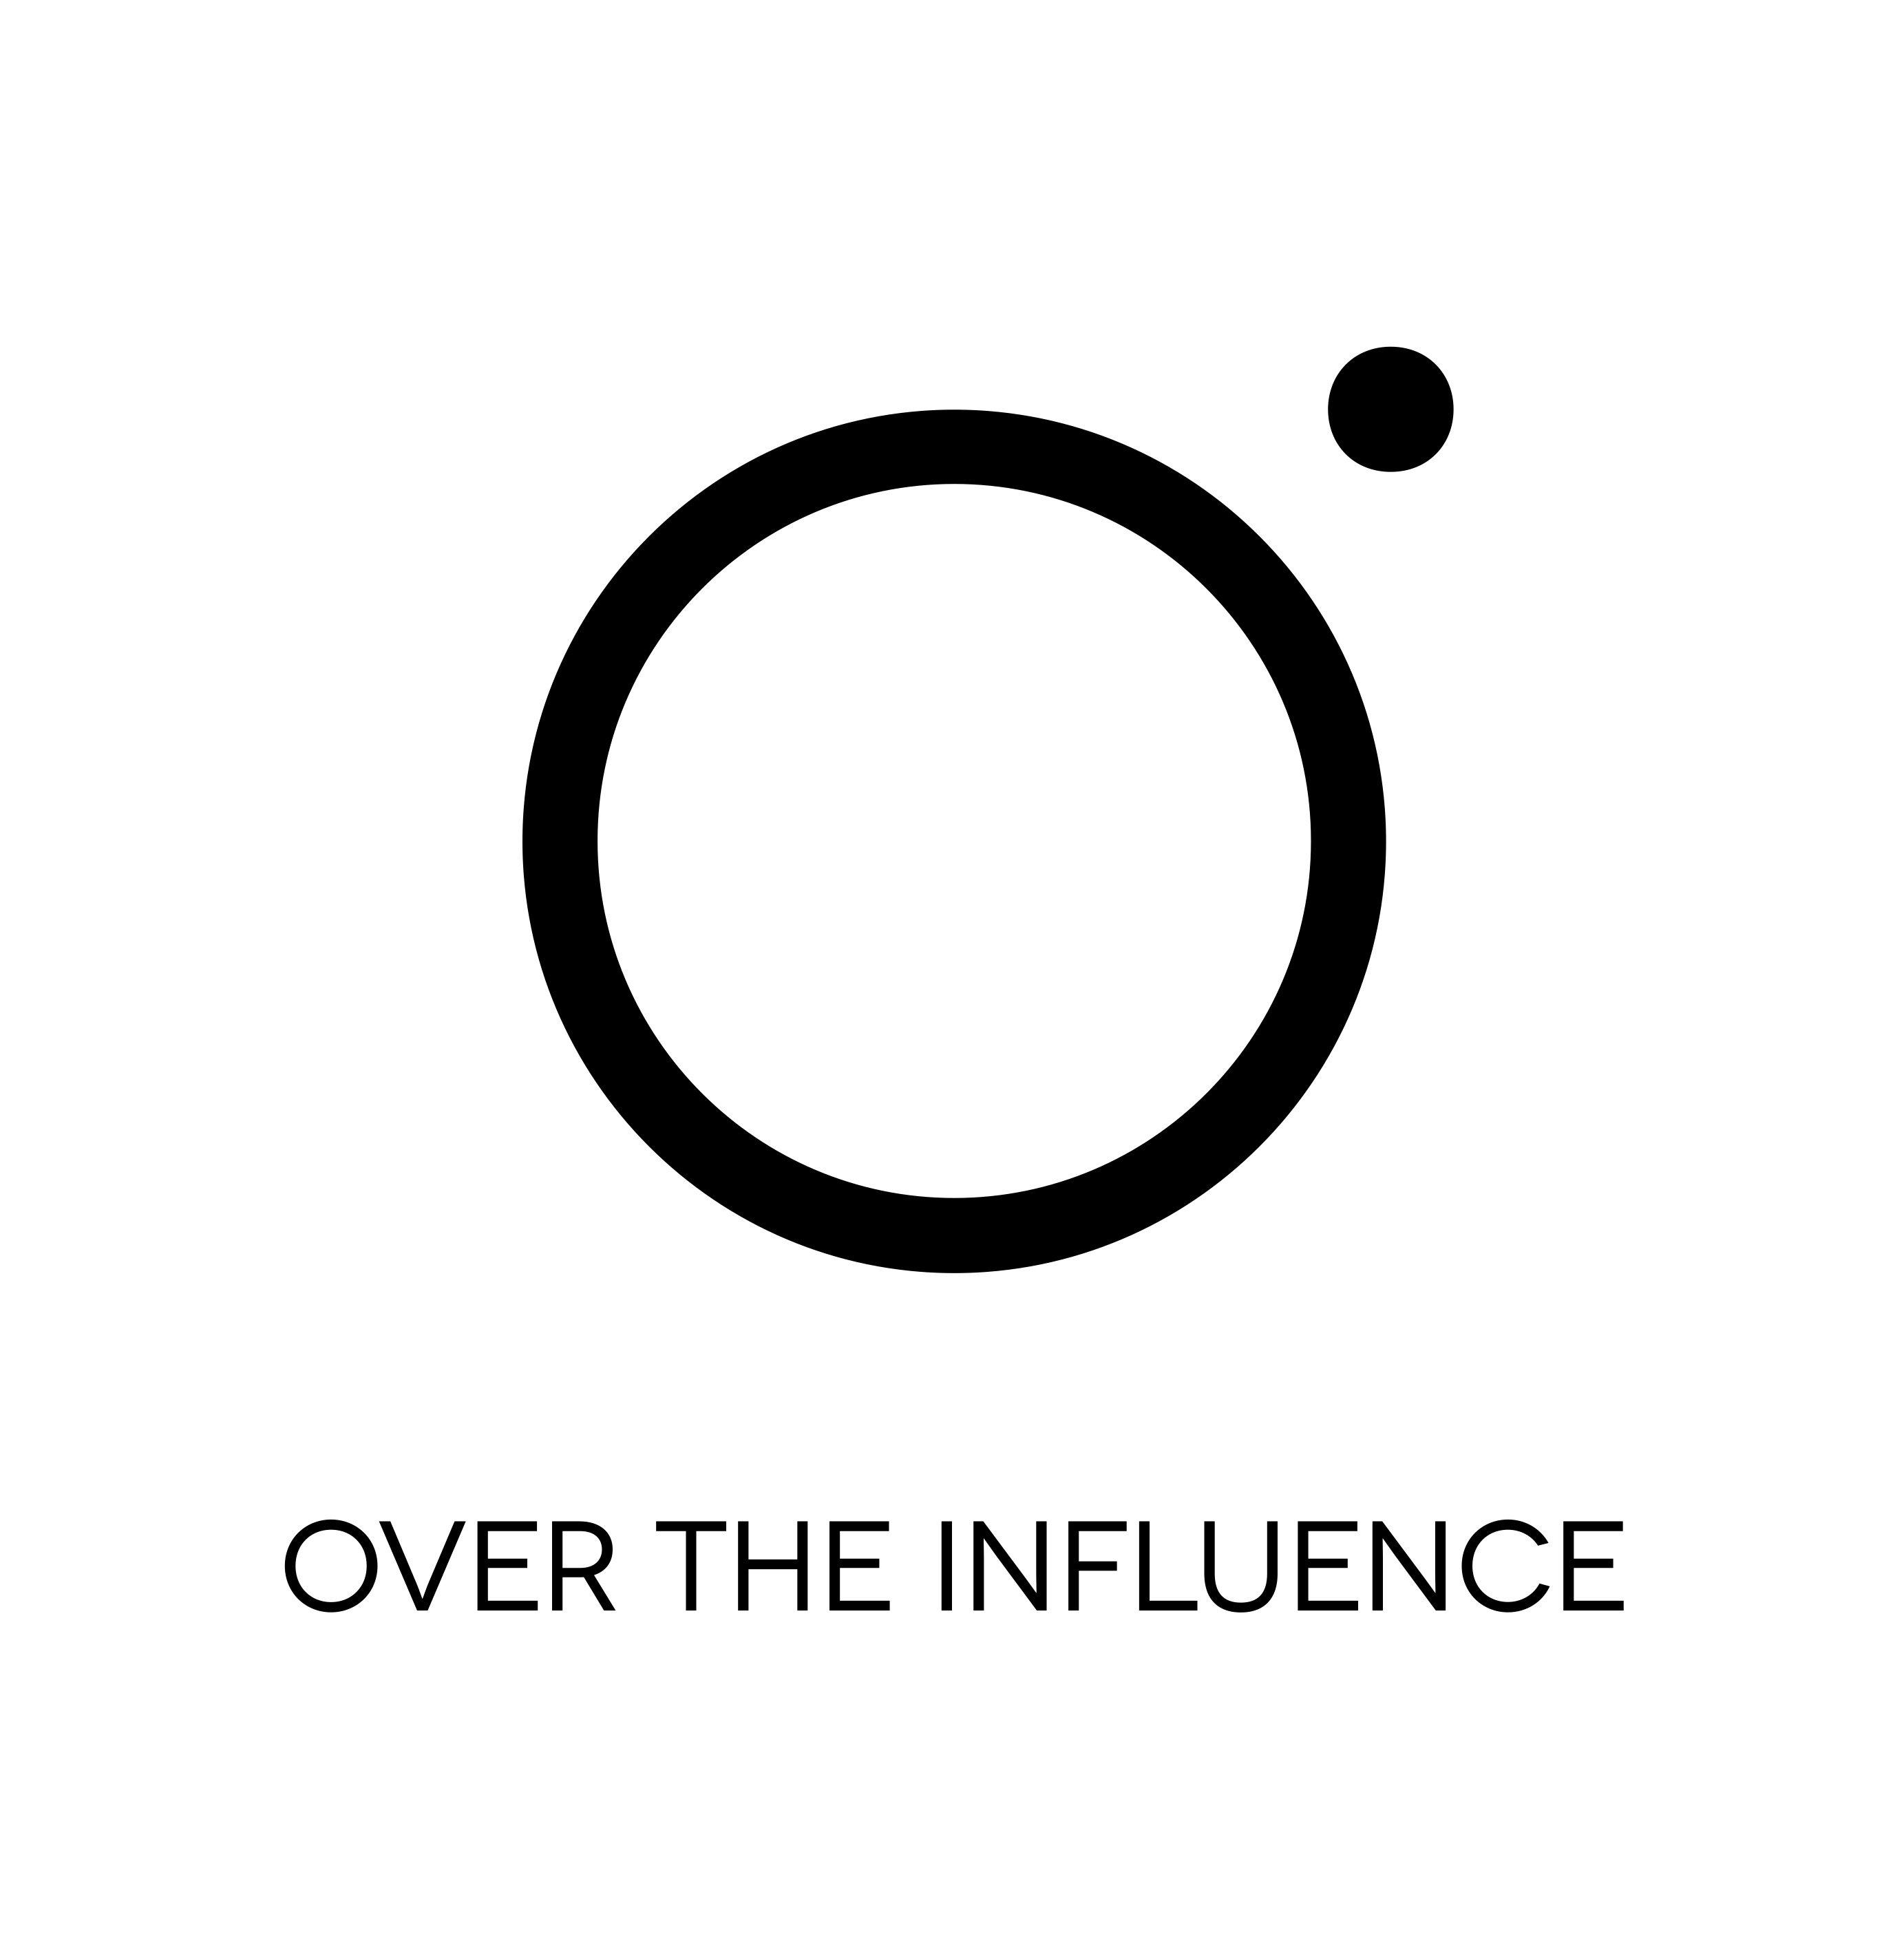 Over the Influence company logo